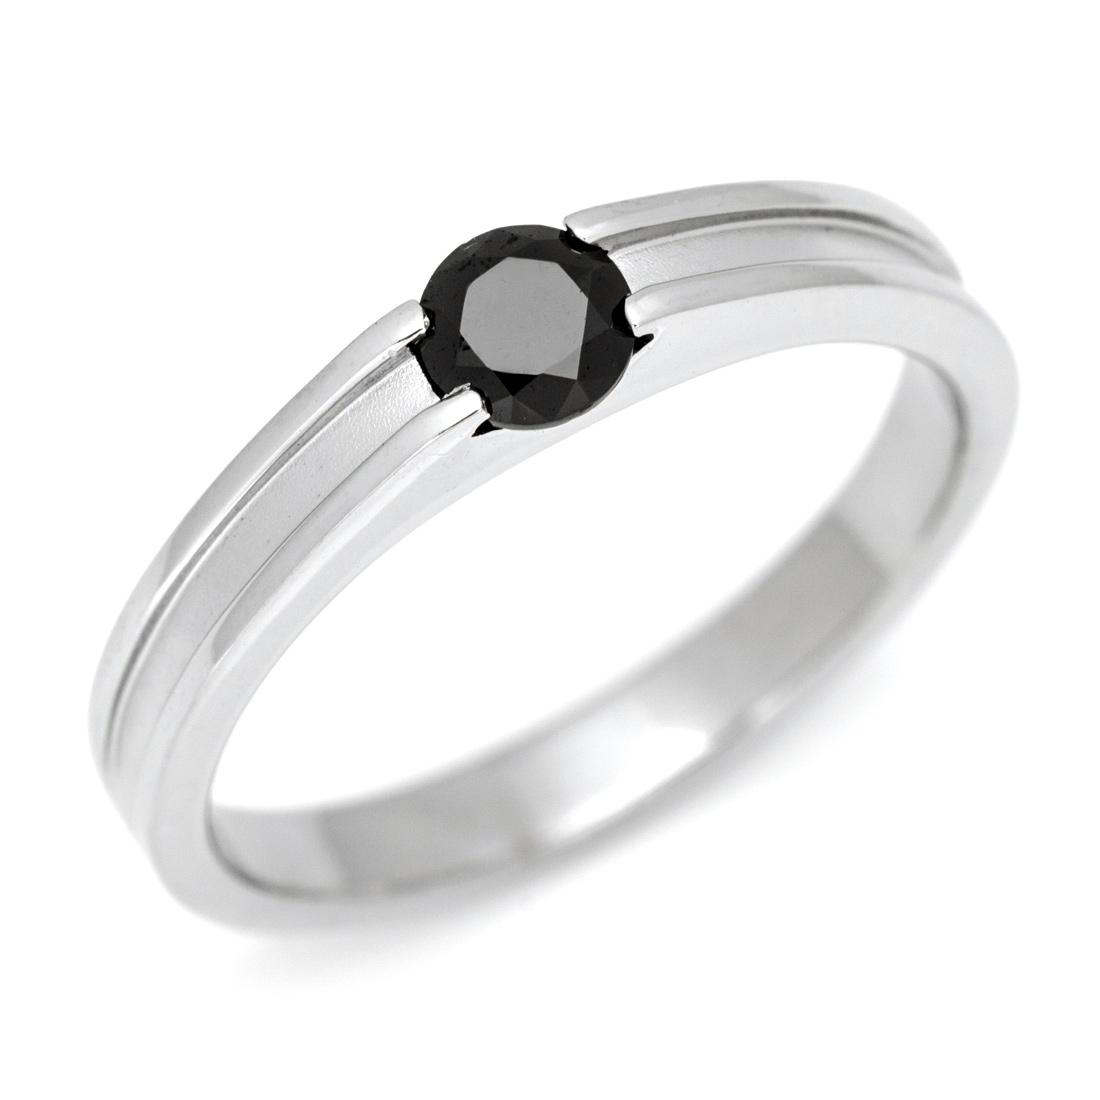 【GWクーポン配布中】SV925 ブラックシグニティキュービックジルコニア リング指輪 シルバー925 SILVER スターリングシルバー 刻印 文字入れ メッセージ ギフト 贈り物 ピンキーリング対応可能